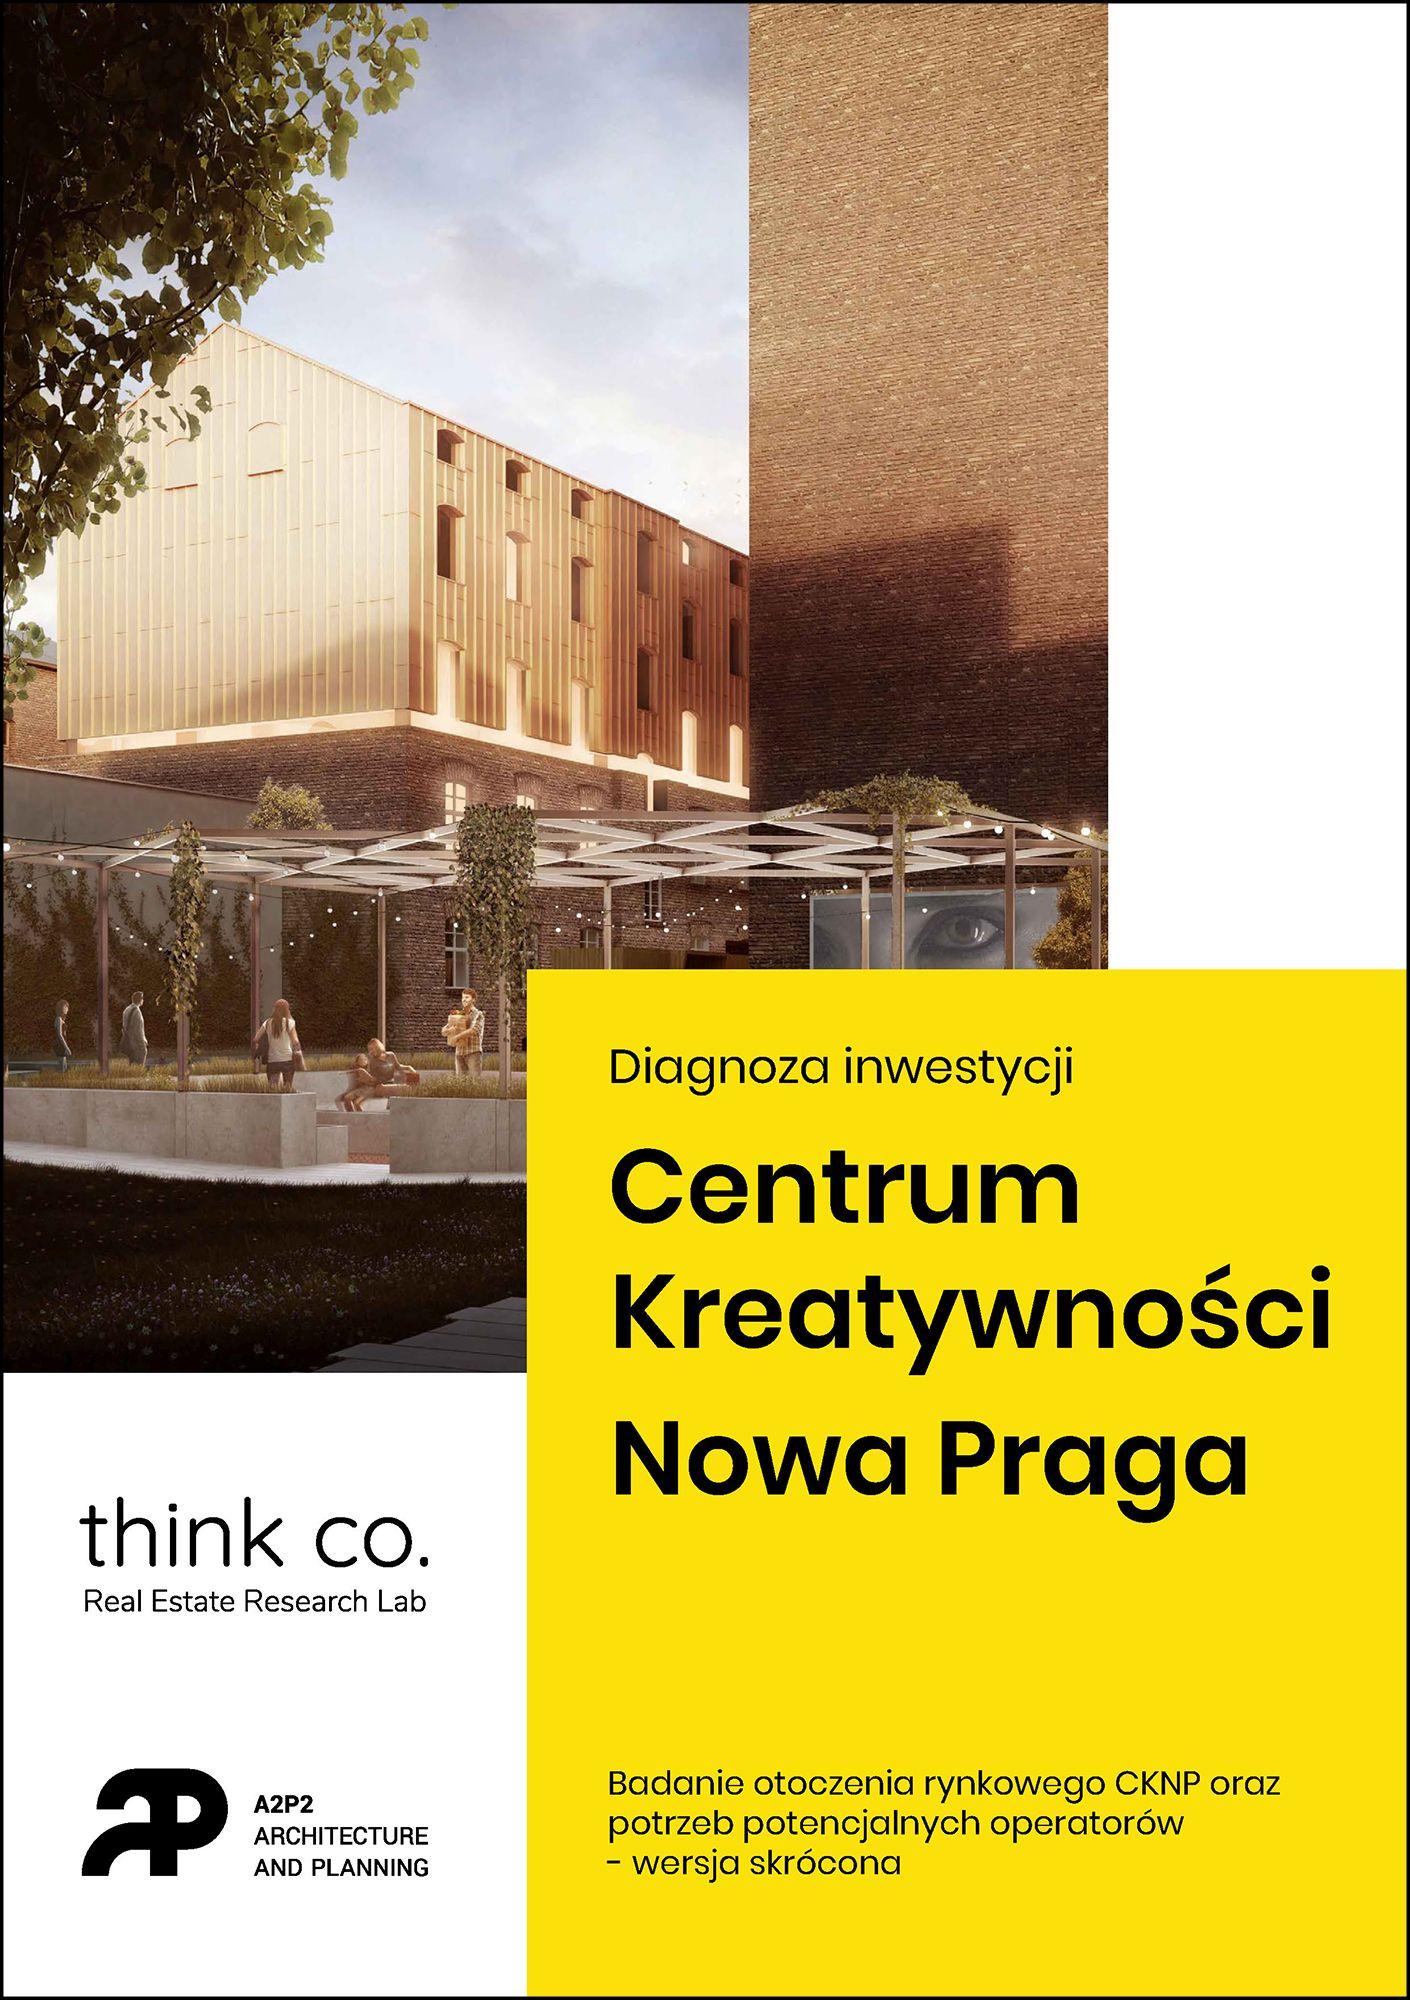 CKNP_think co.